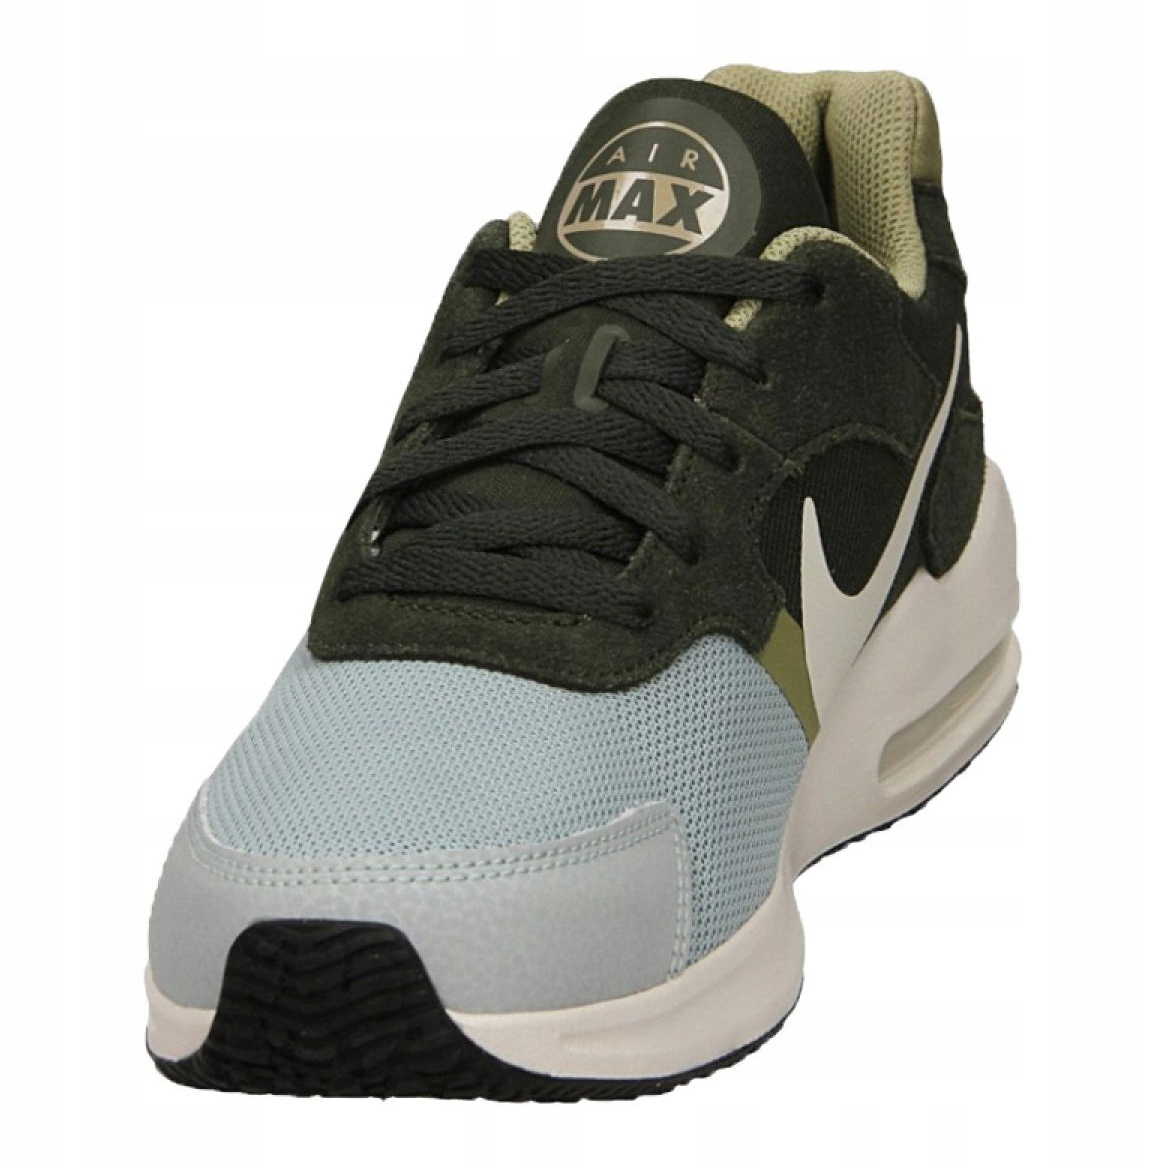 Nike Air Max Prime M 876068 005 cipő fekete ButyModne.pl